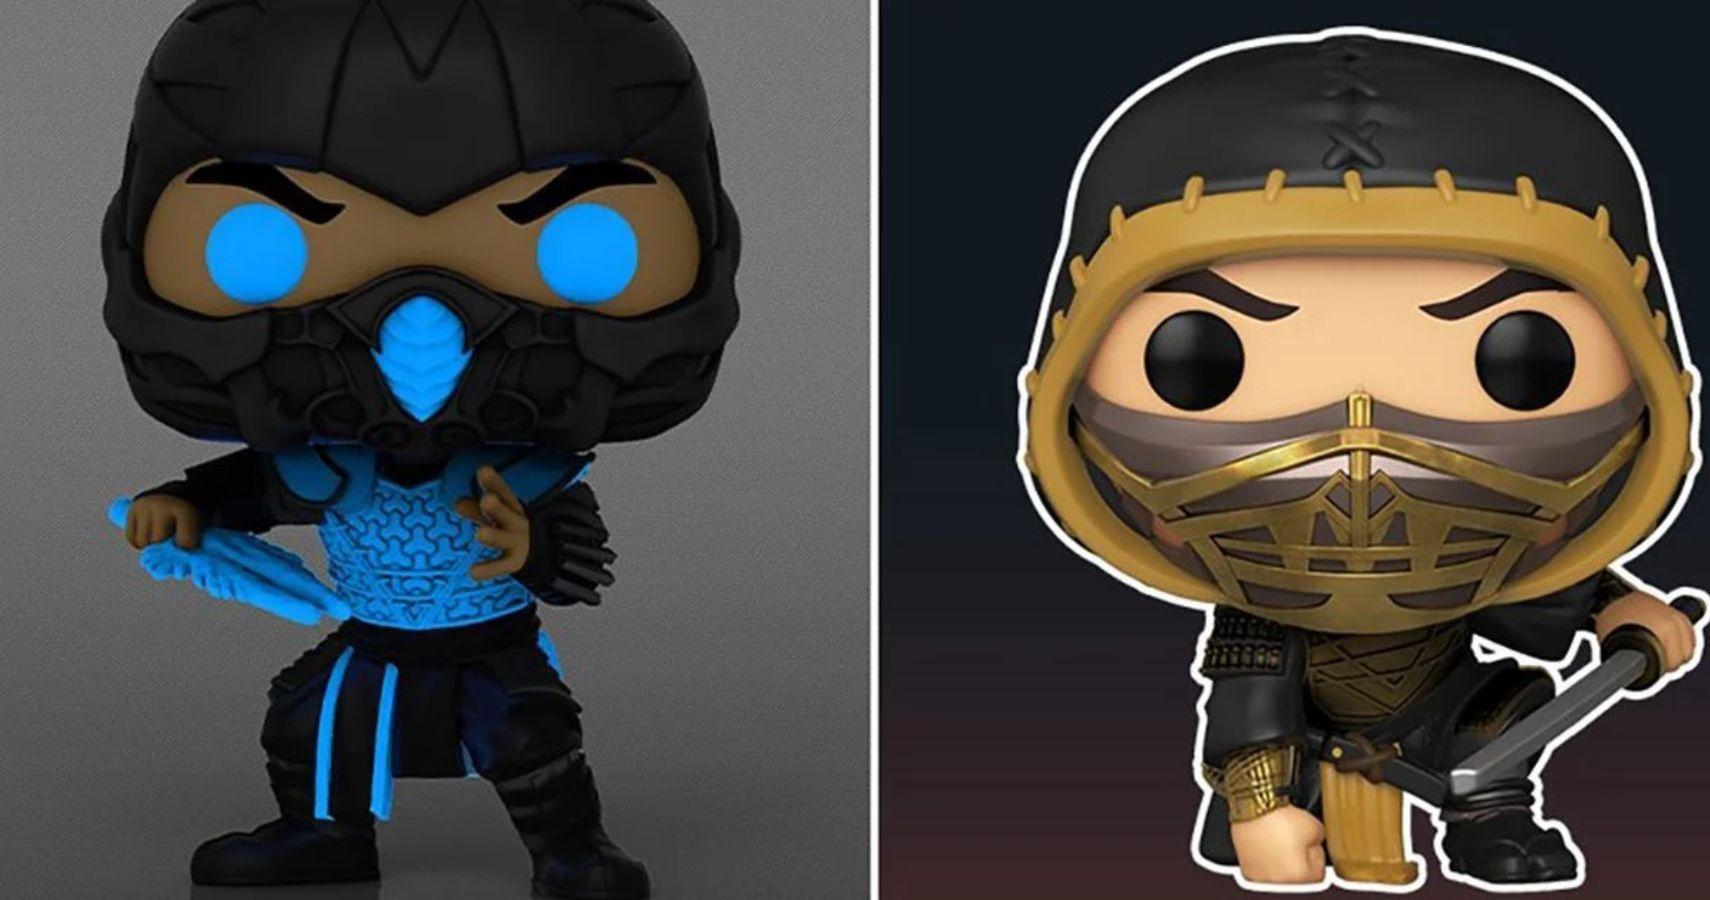 Mortal Kombat Funko Pop Line Revealed, Including Scorpion, Sonya Blade, And Sub-Zero